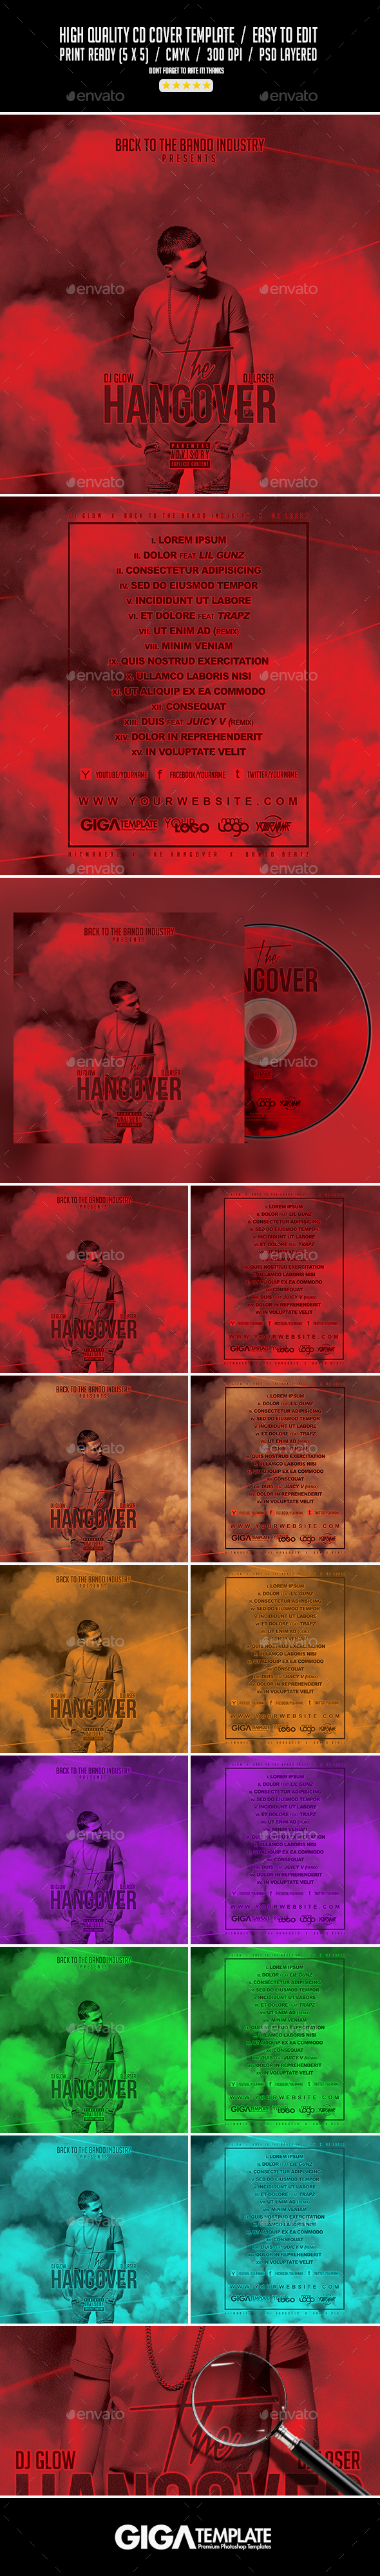 The Hangover | Mixtape Album CD Cover Template - CD & DVD Artwork Print Templates